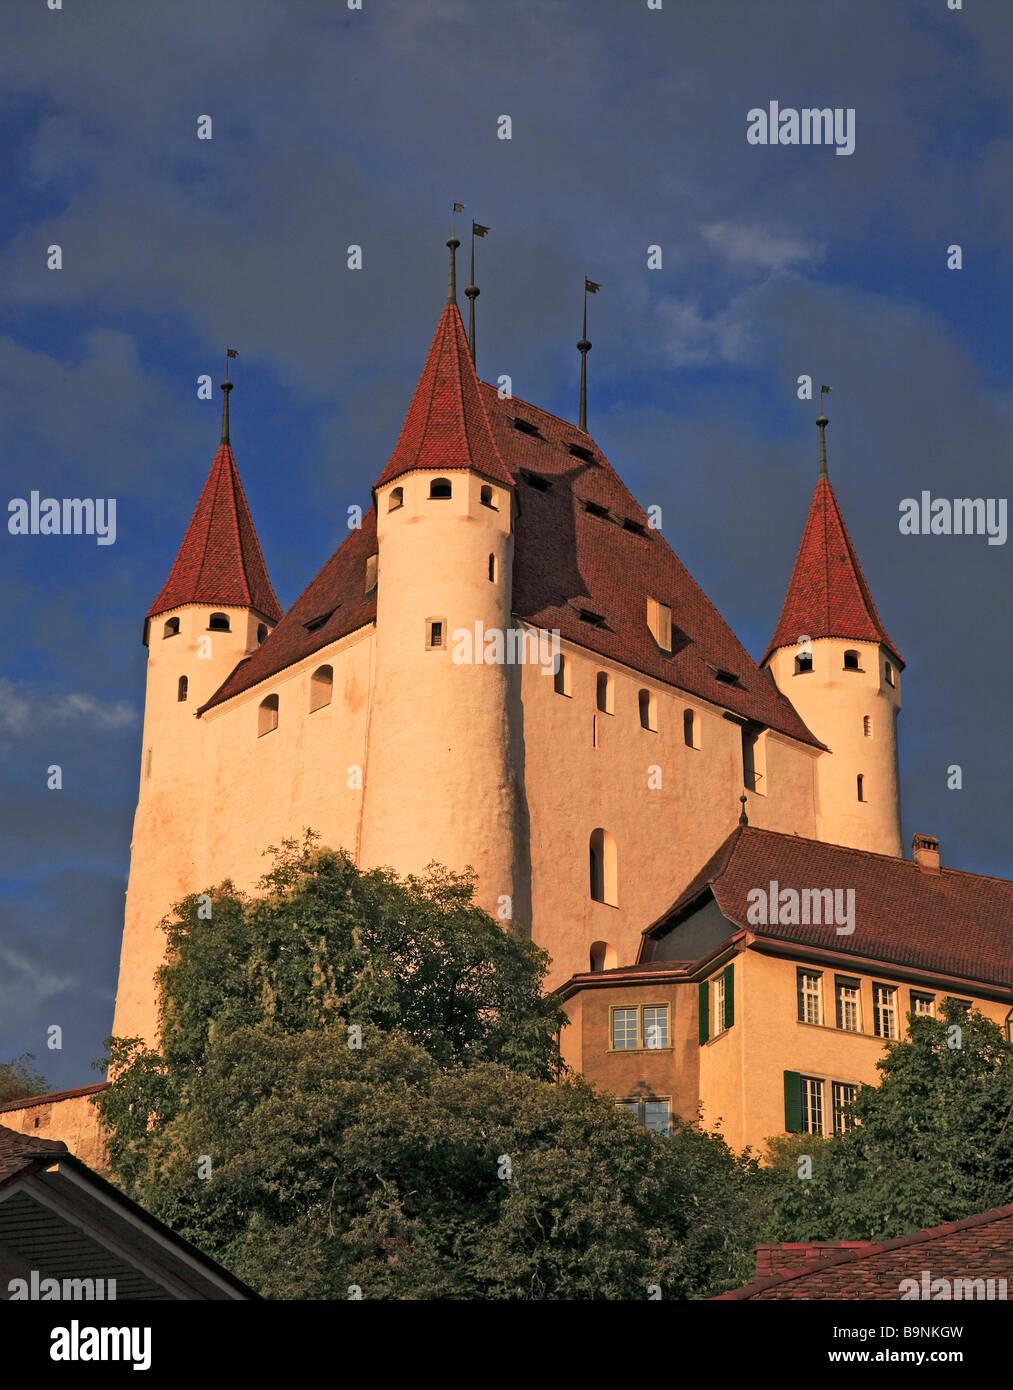 castle of Thun Berner Oberland Switzerland - Stock Image